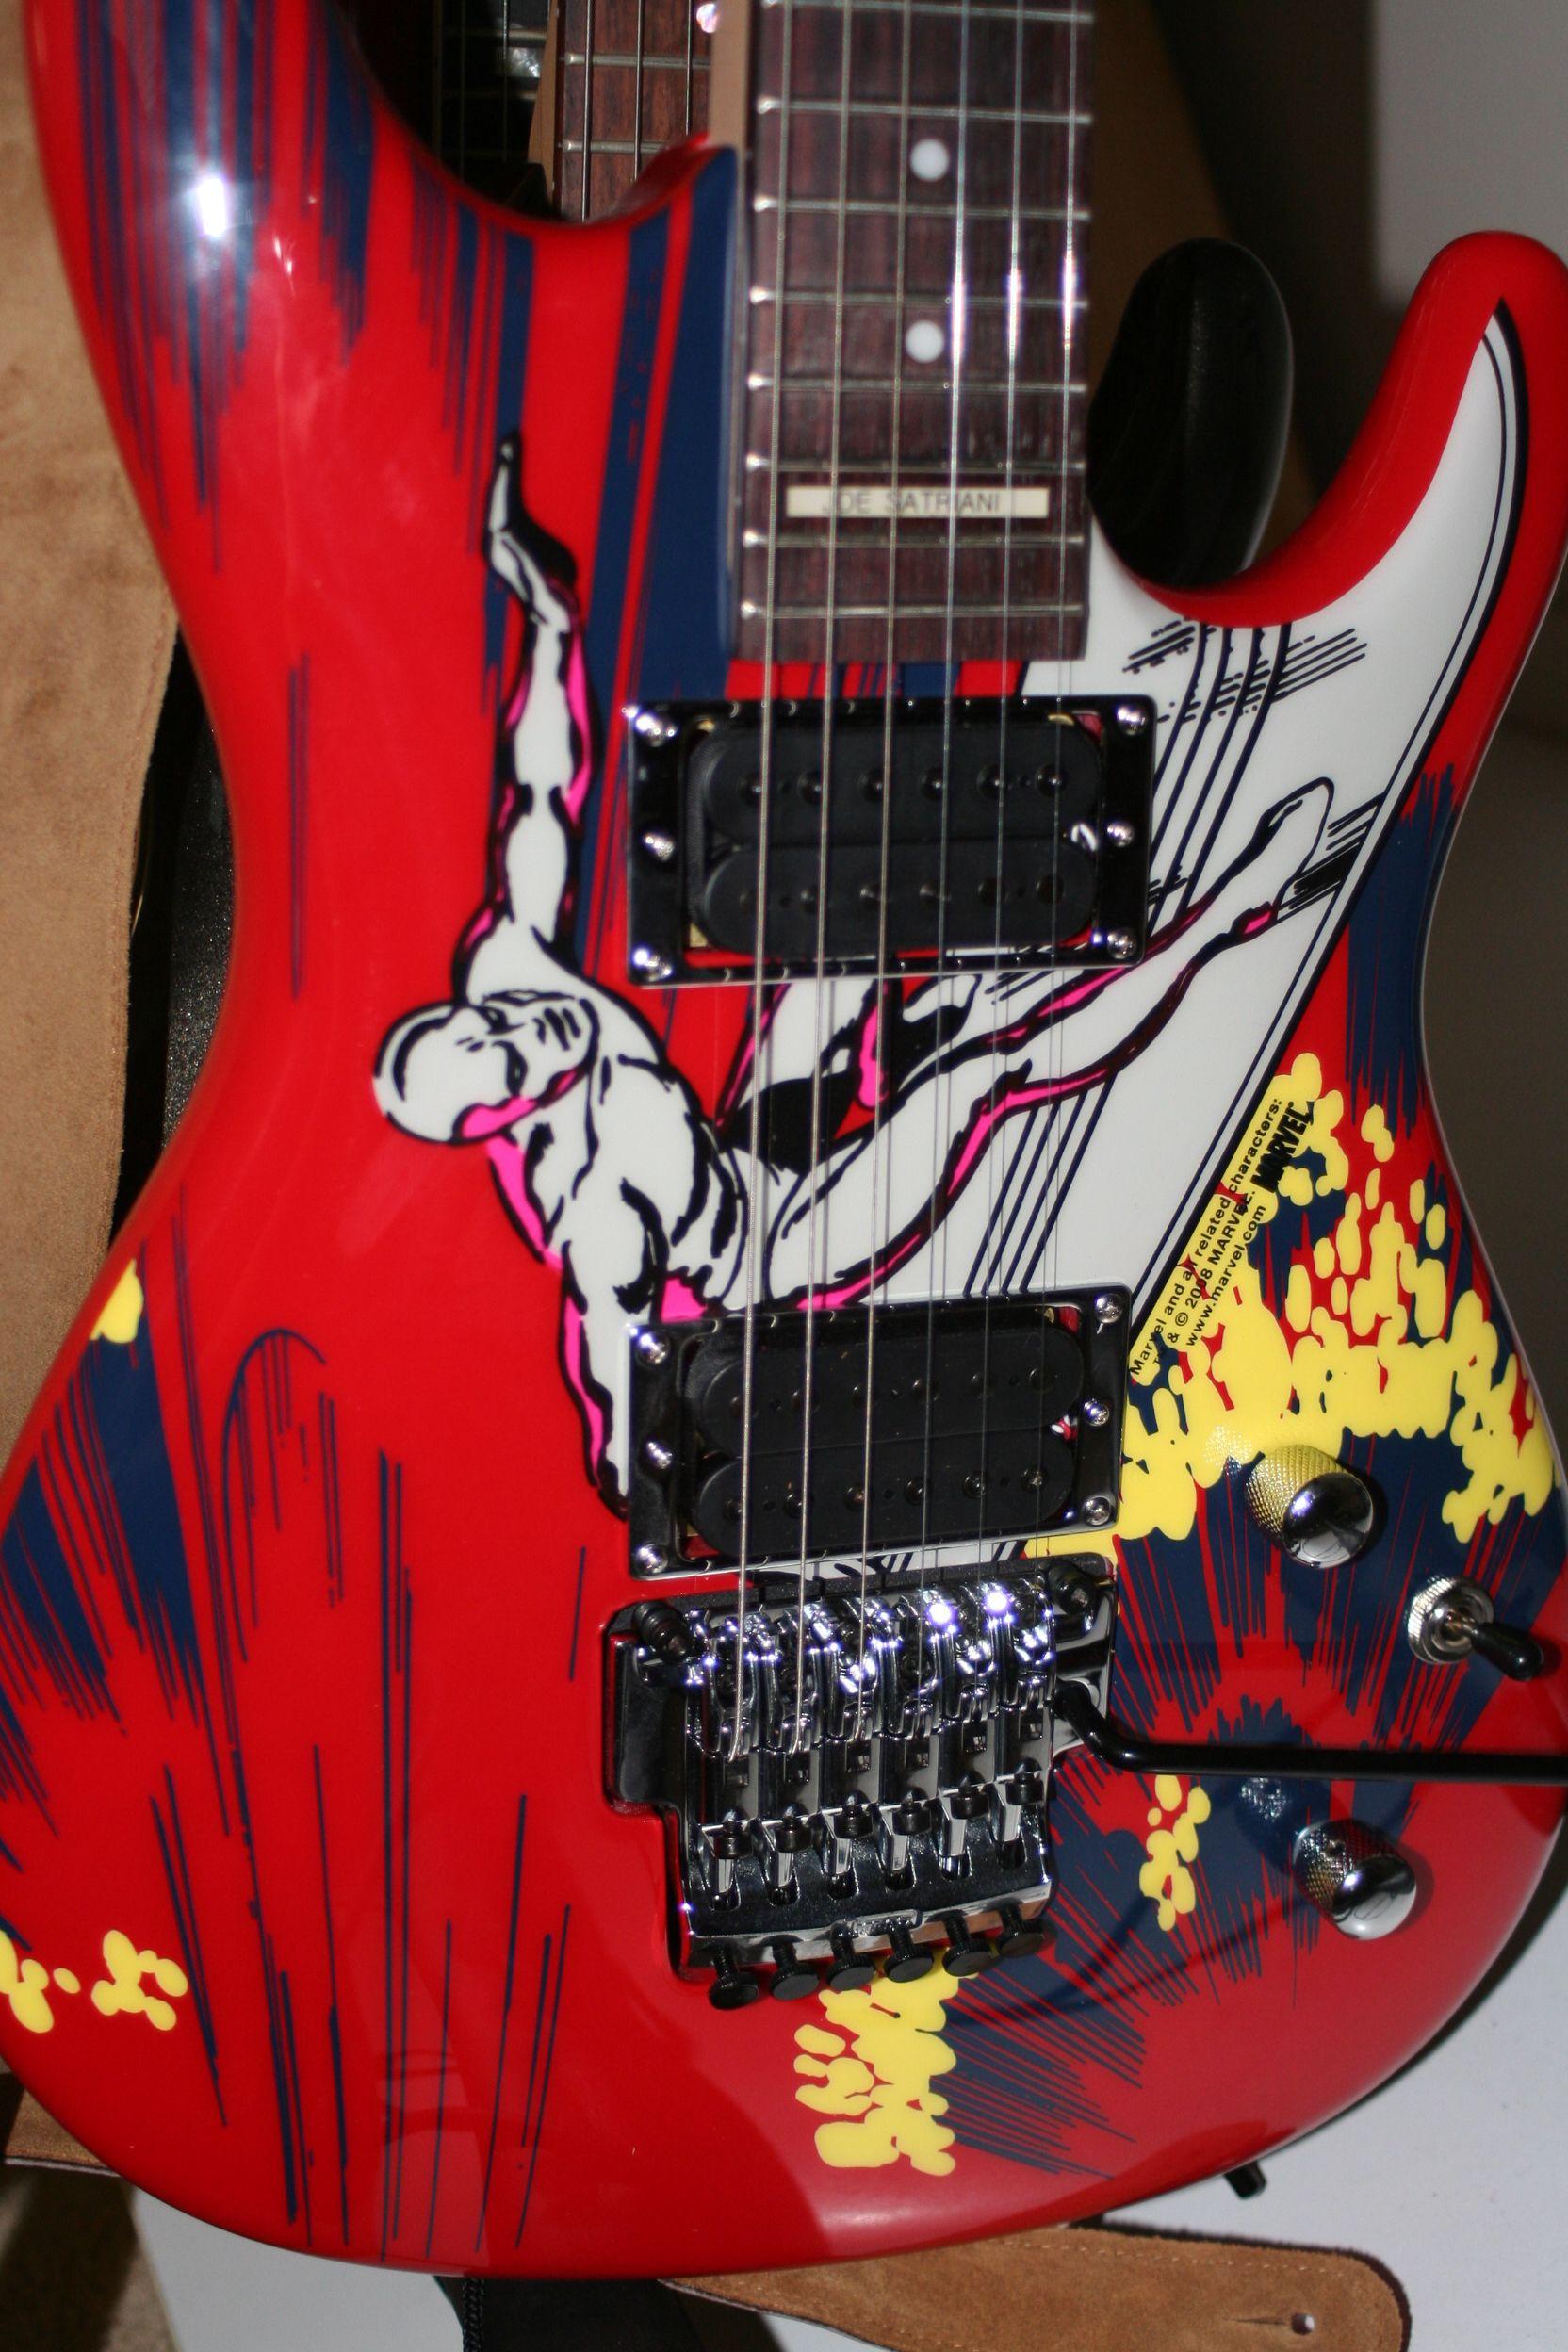 My 2009 Ibanez Joe Satriani Silver Surfer guitar